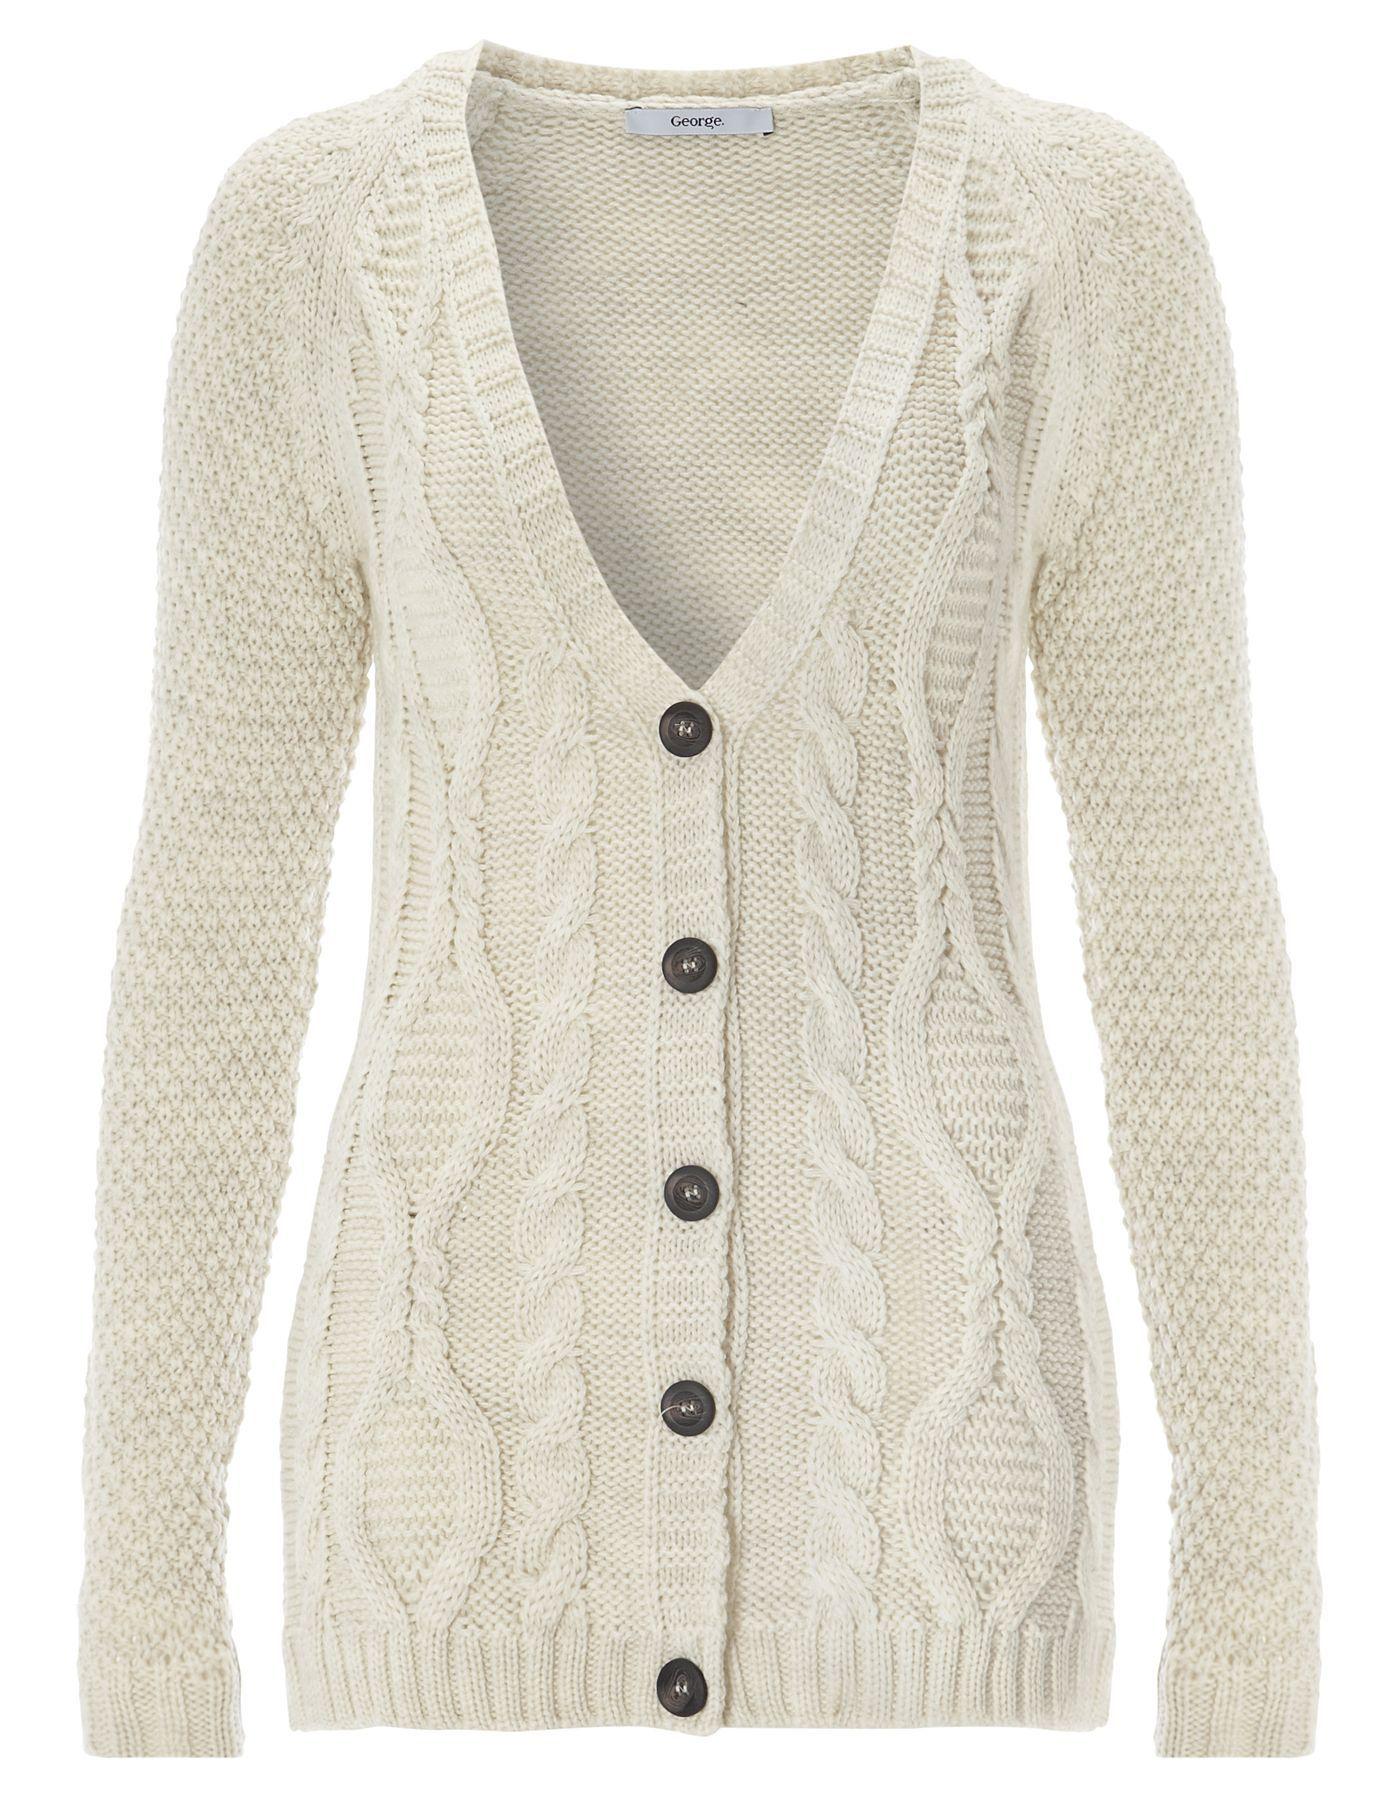 Cable Knit Boyfriend Cardigan - Cream | Women | George at ASDA ...